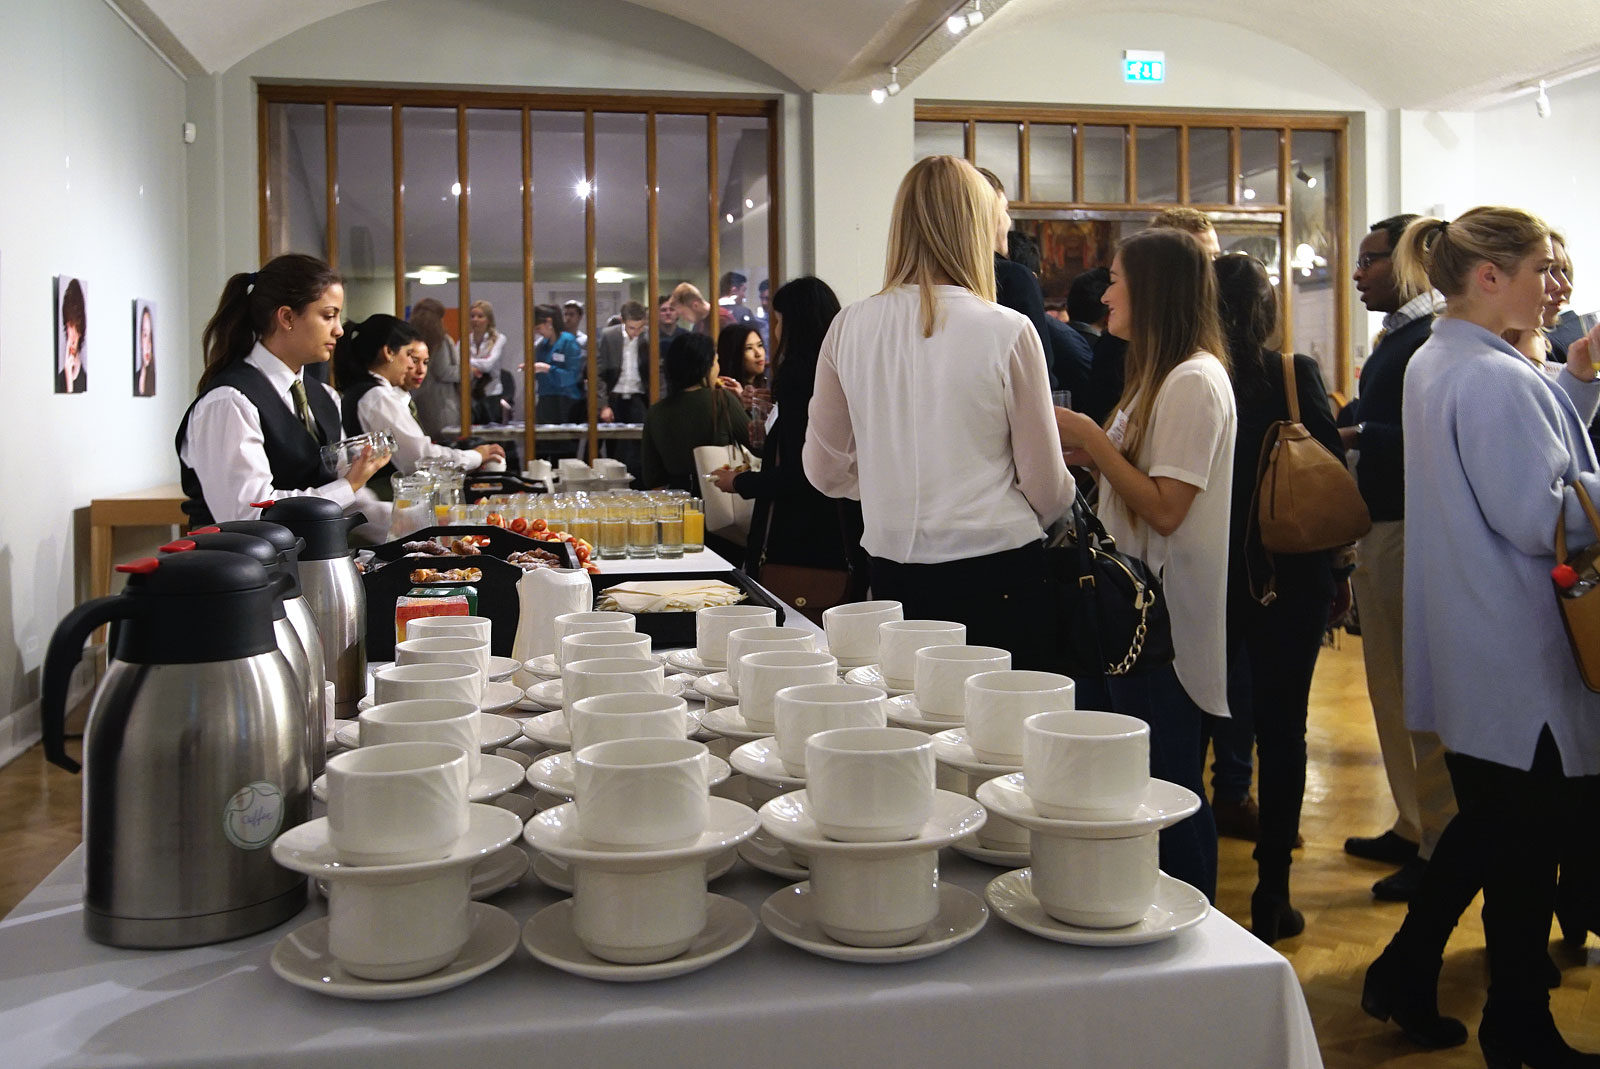 Morning coffee at London EC2 conference venue The Van Gogh Reception Room